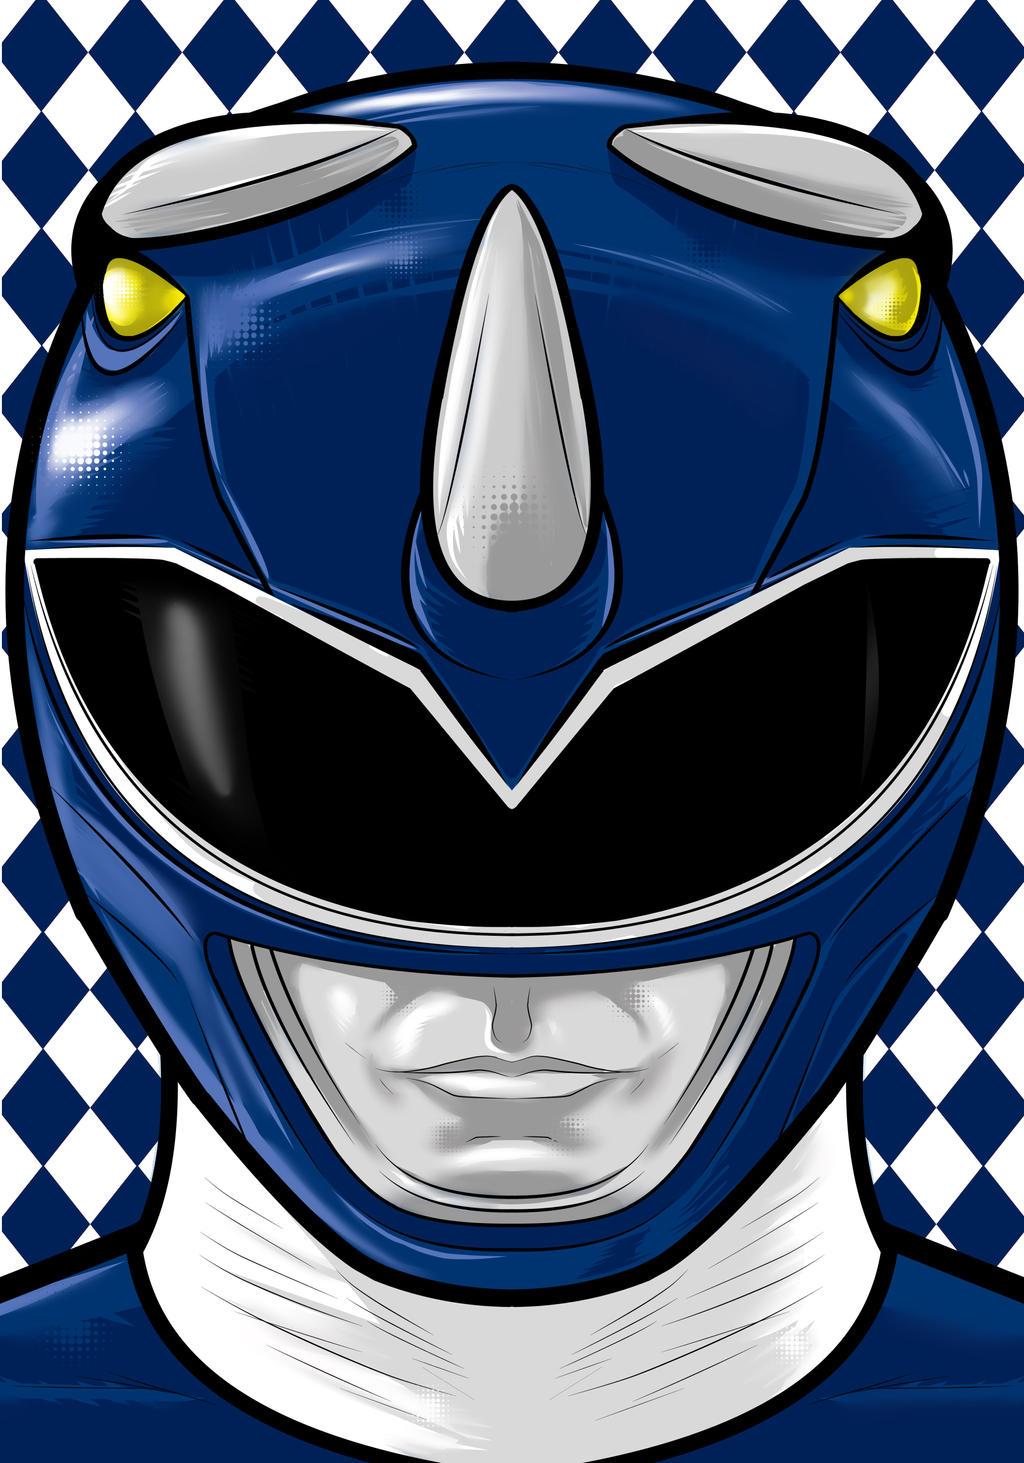 Blue Ranger By Thuddleston On Deviantart